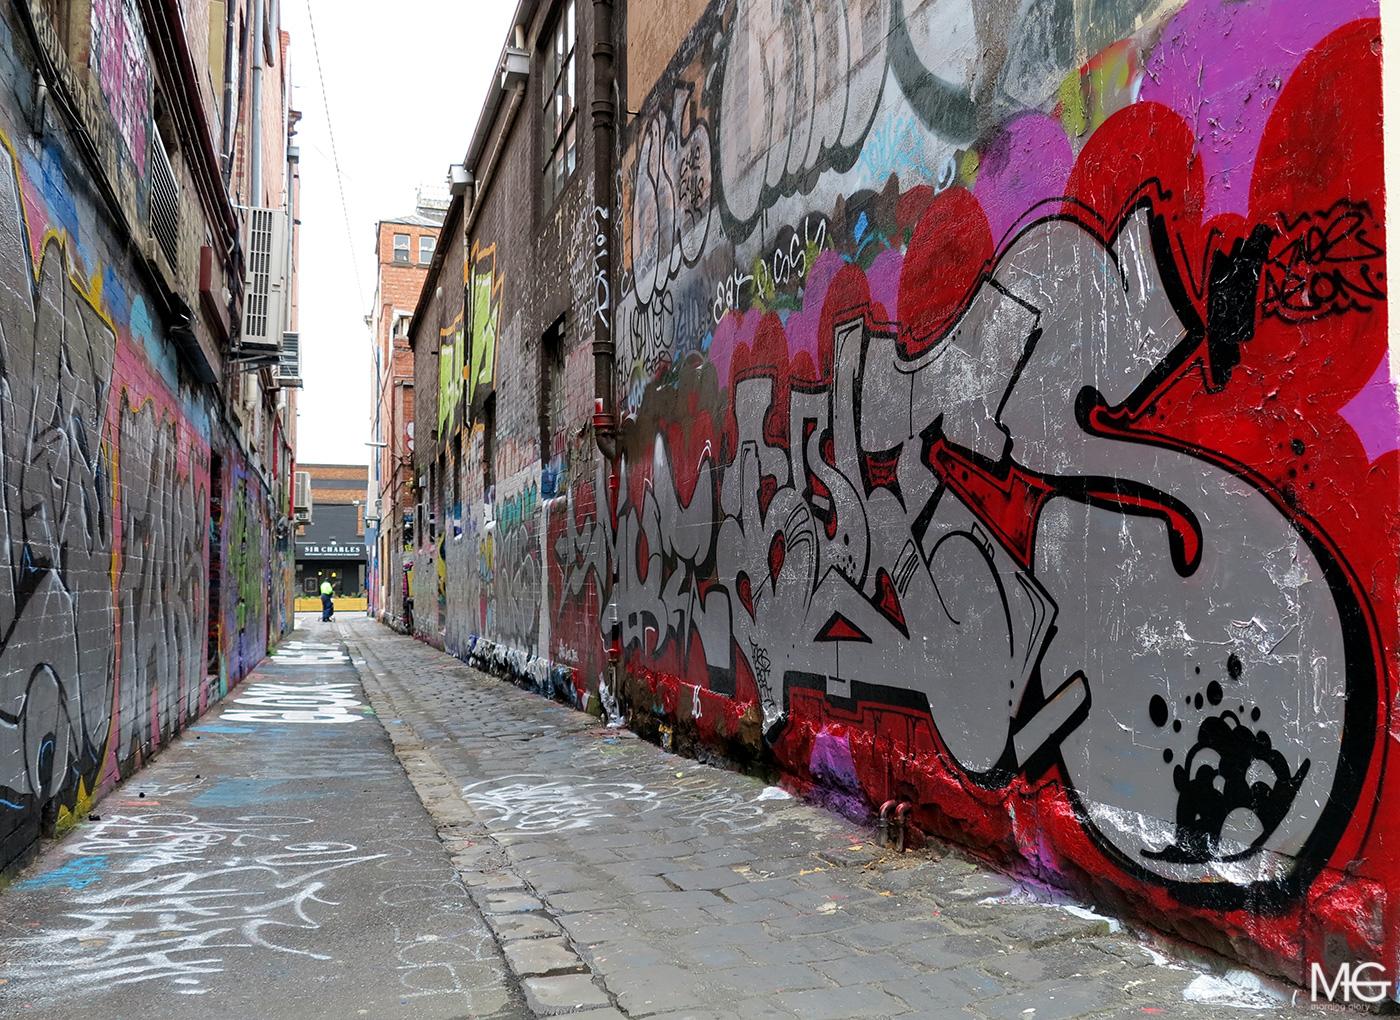 Smut-Bolts-Fitzroy-Graffiti-Morning-Glory-Melbourne4